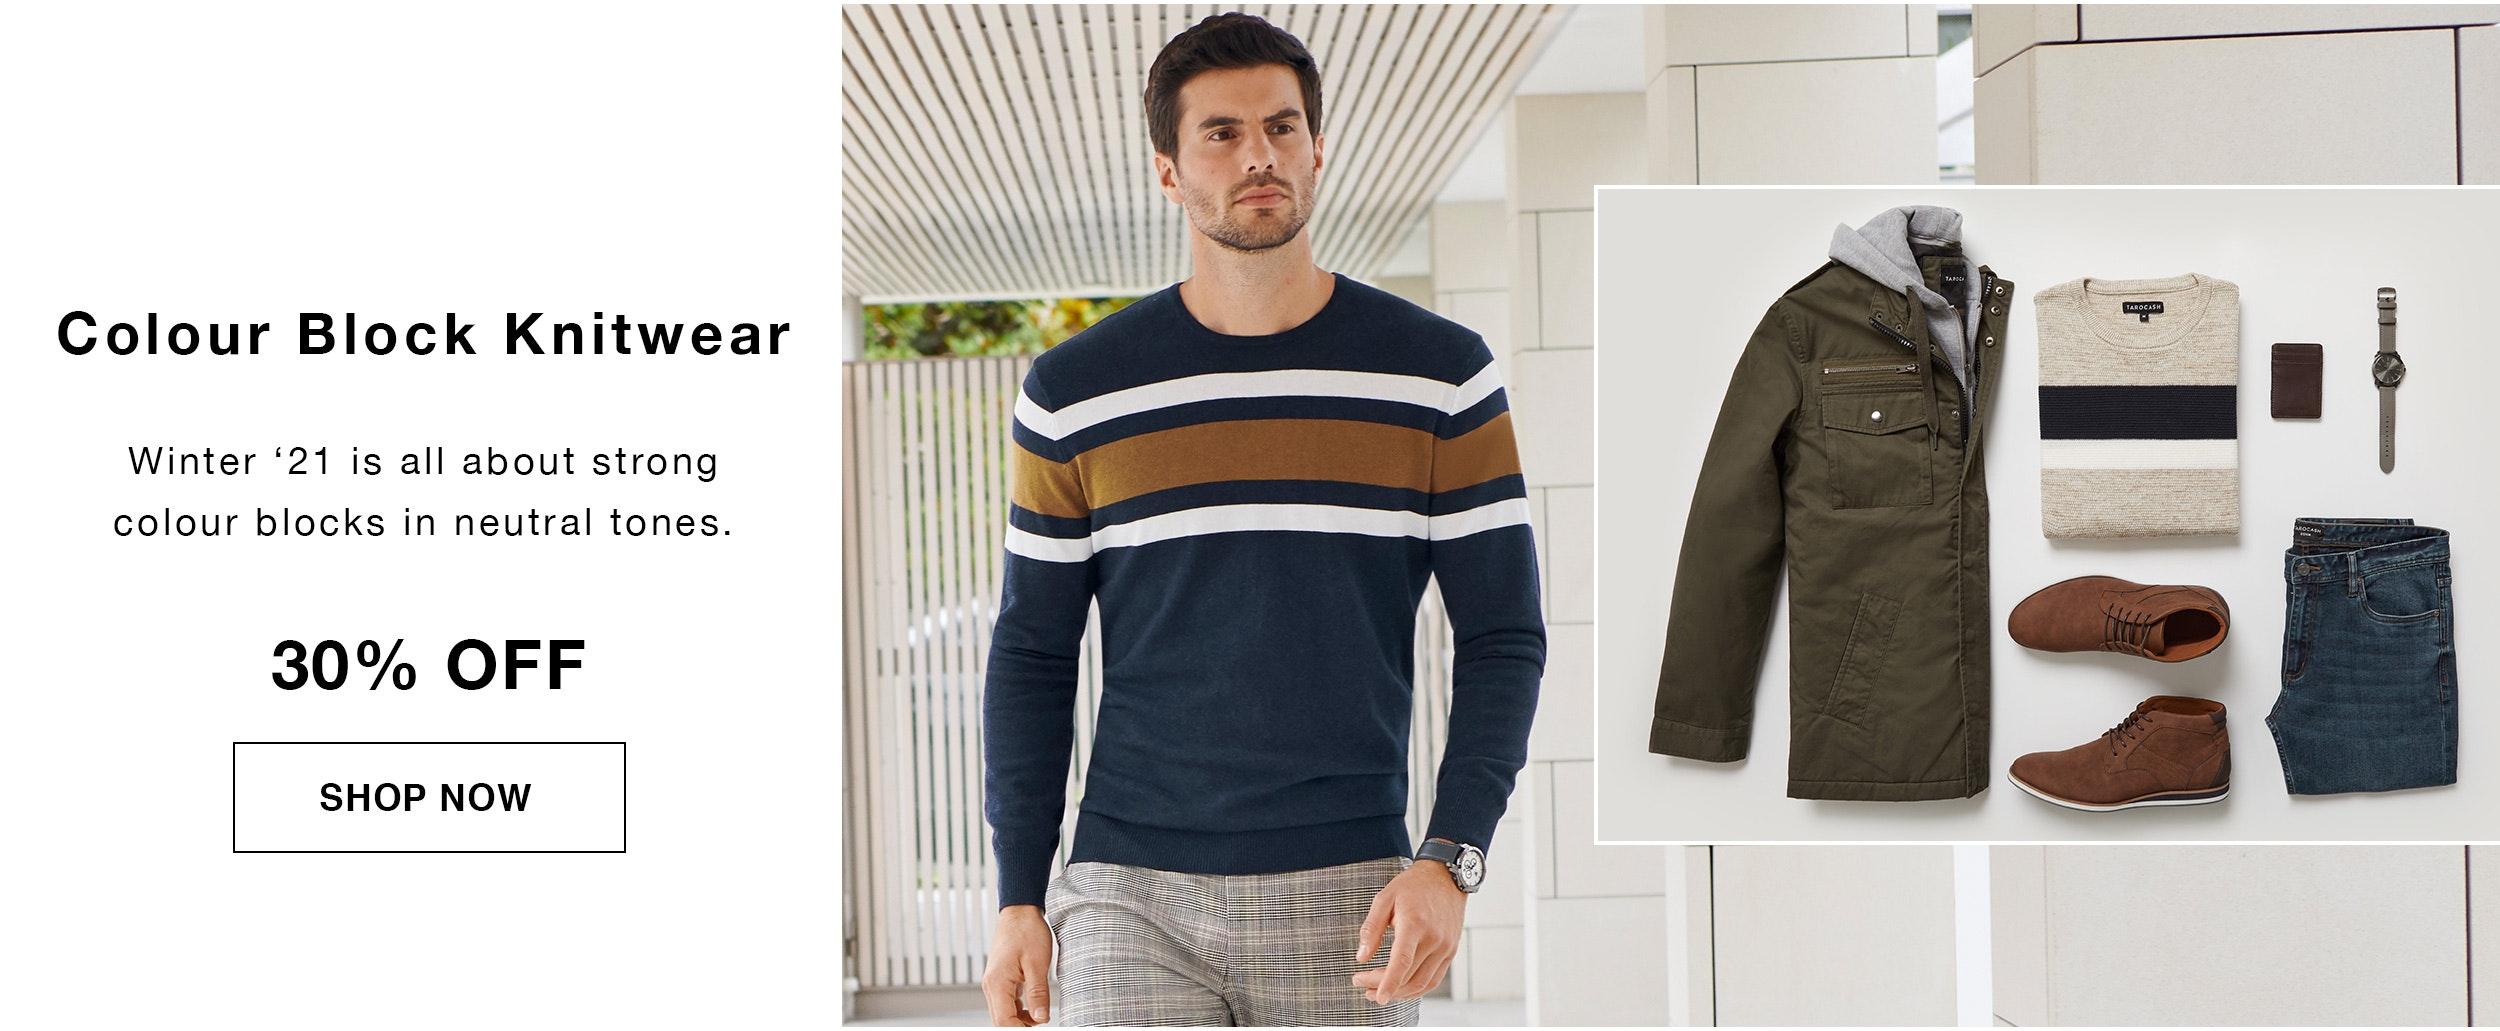 Shop Colourblock Knitwear